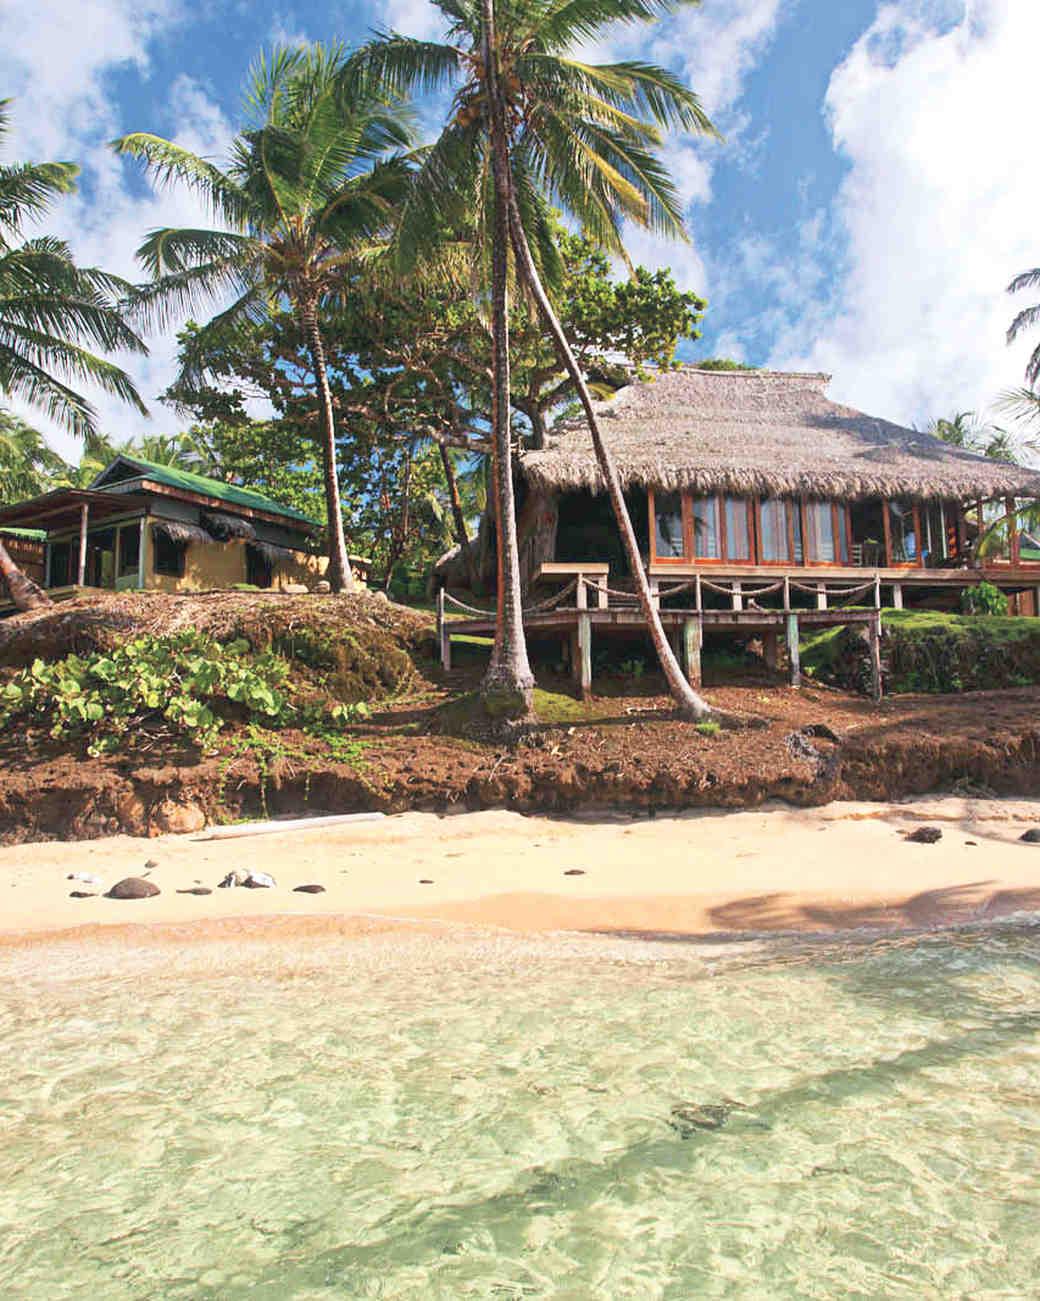 palm-tree-tropical-lodge-yemaya-img-1203-mwds111006.jpg